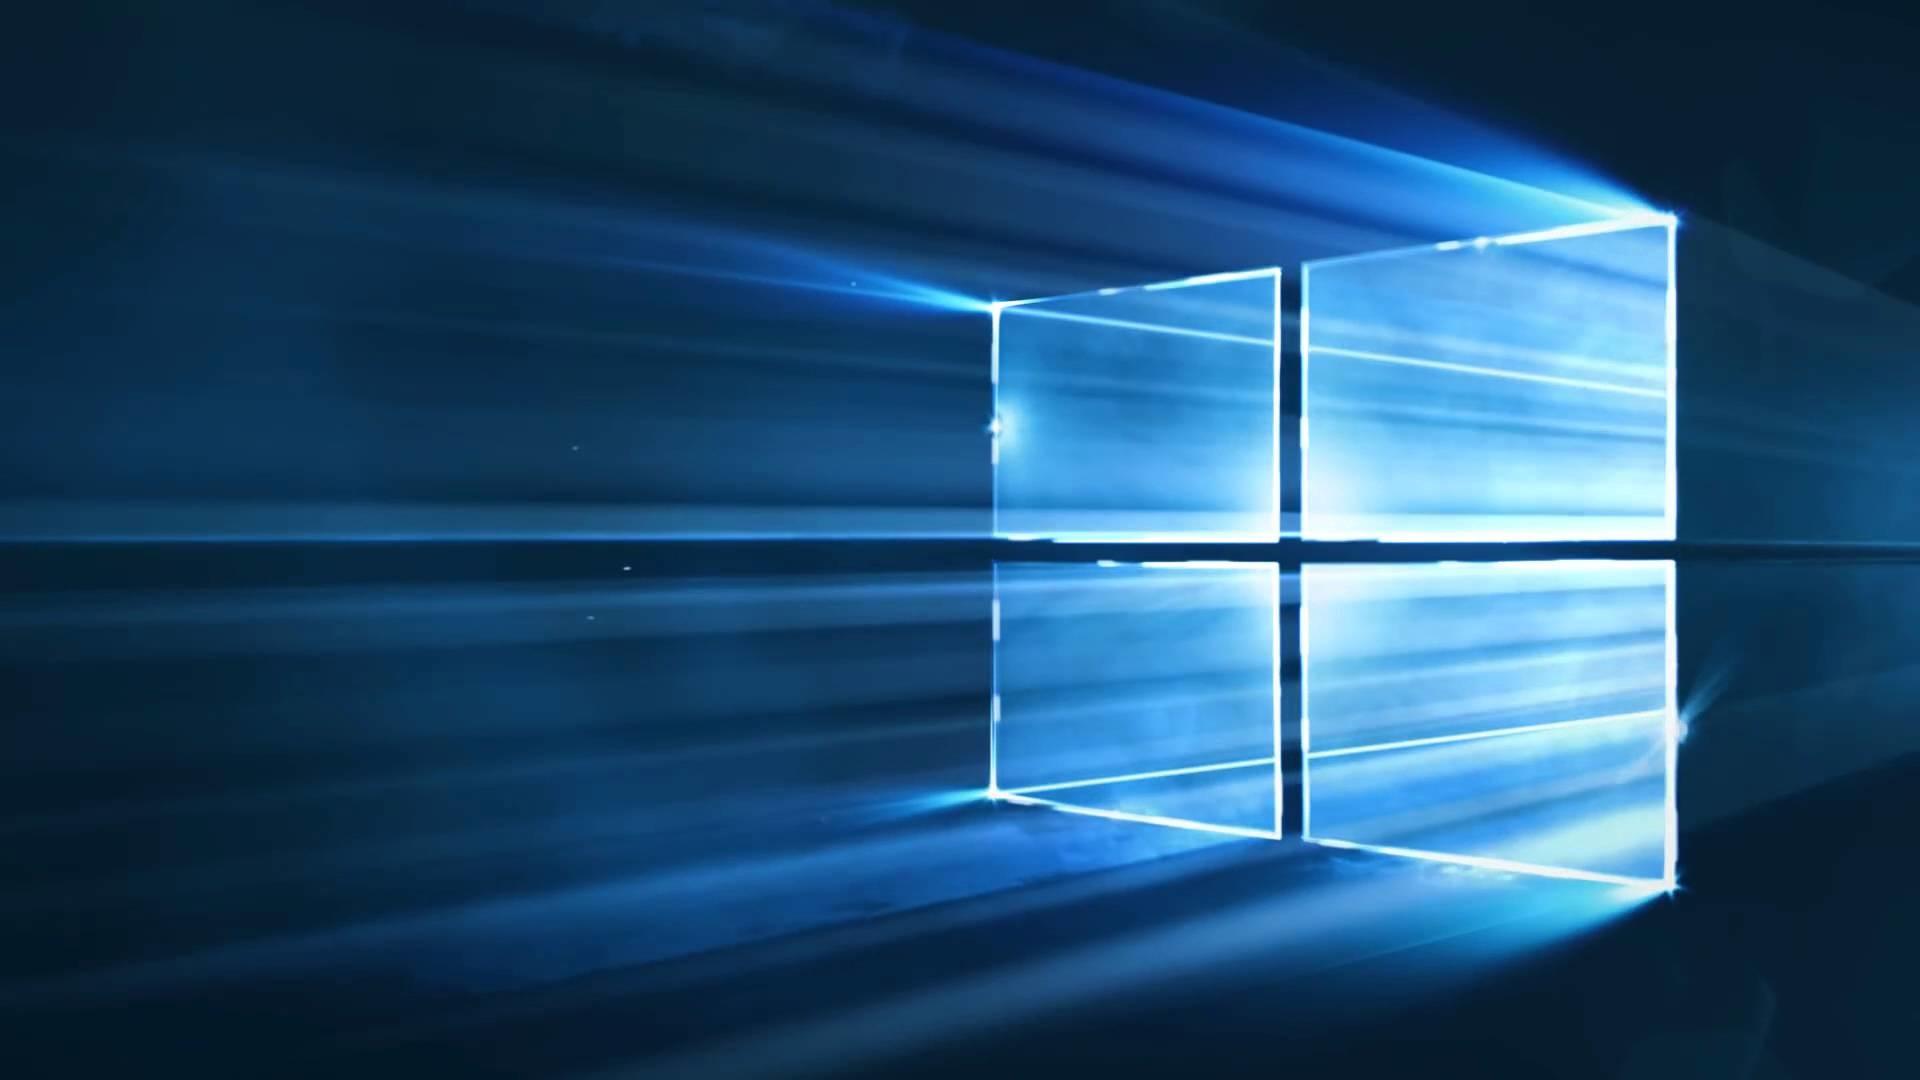 Windows 10 'Hero' logo animated loop